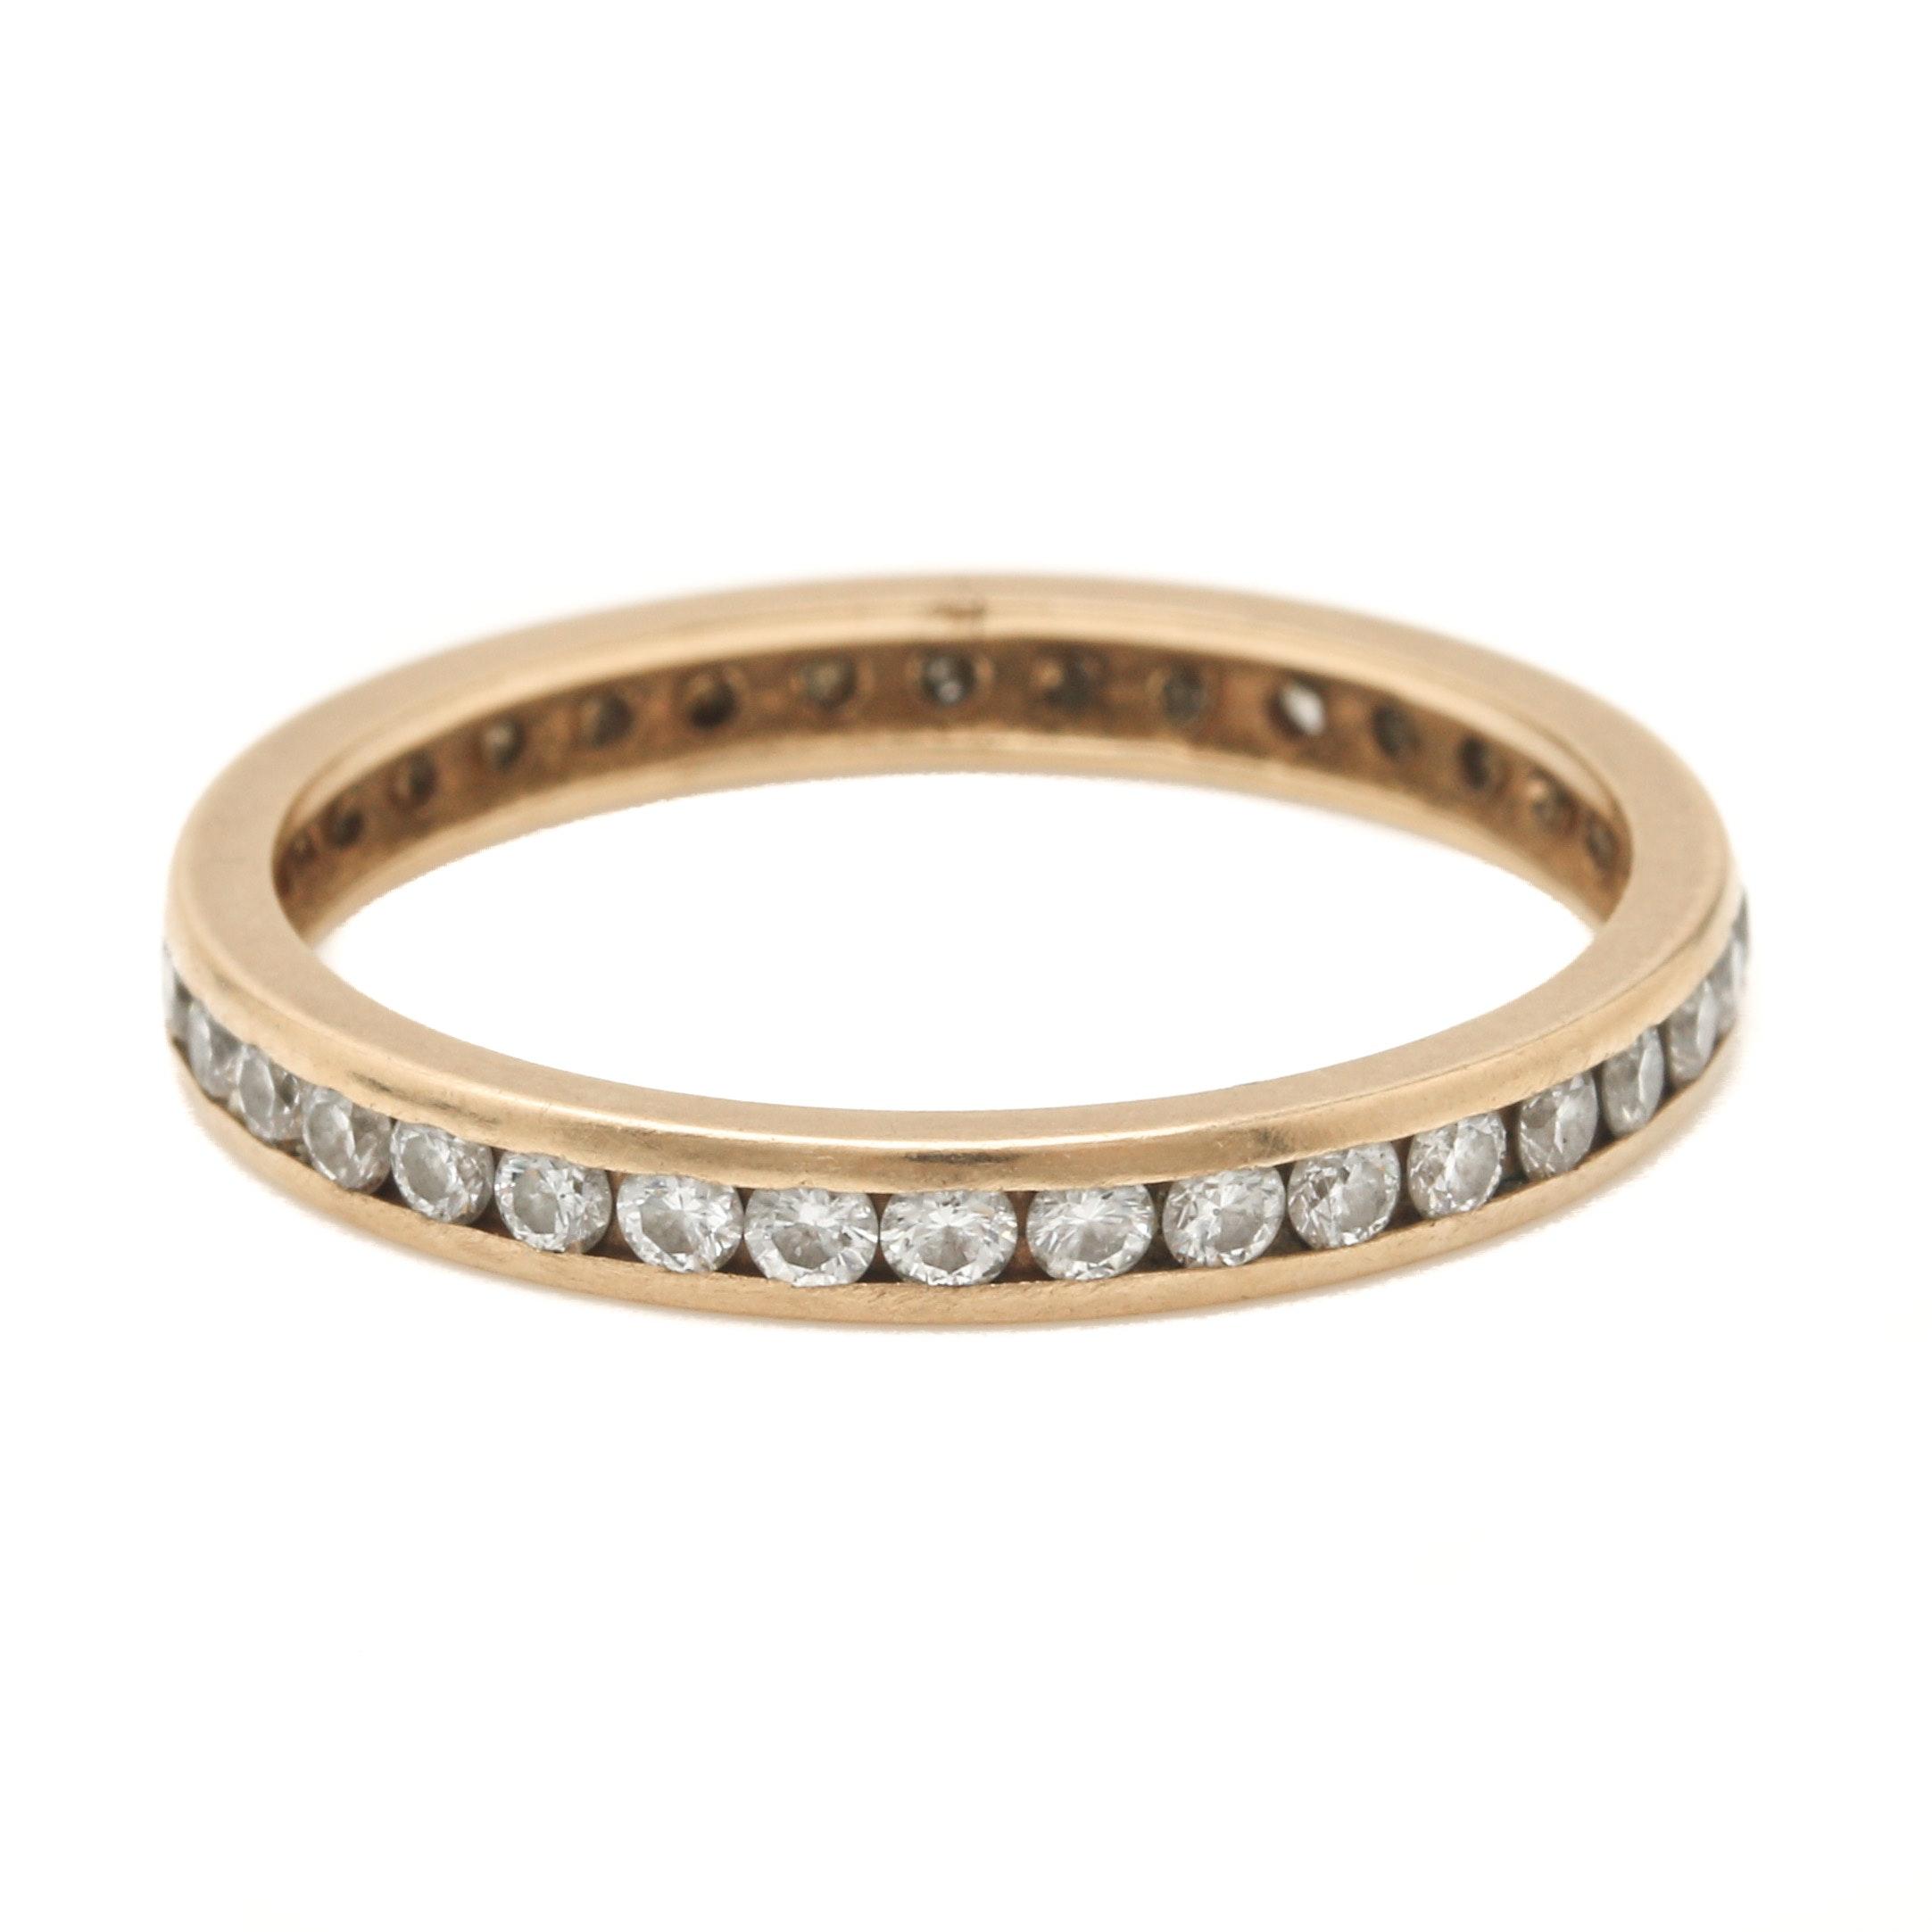 14K Yellow Gold Diamond Eternity Ring